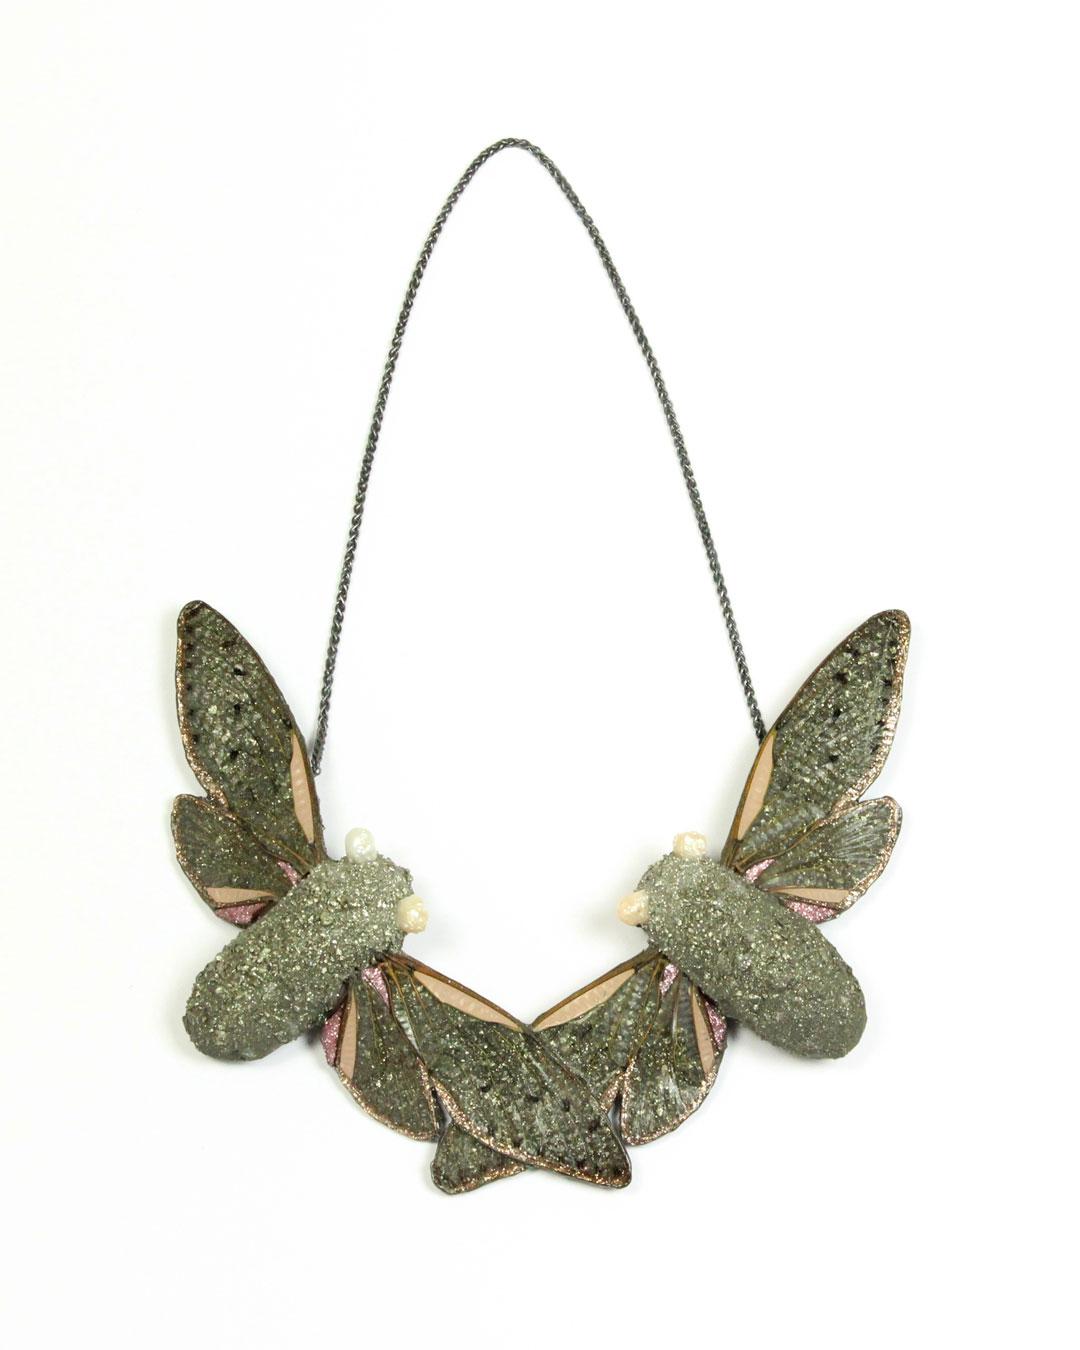 Märta Mattsson, Eyes Like Pearls, 2019, necklace; cicadas, pyrite, pearls, resin, lacquer, silver, 350 x 200 x 40 mm, €2920